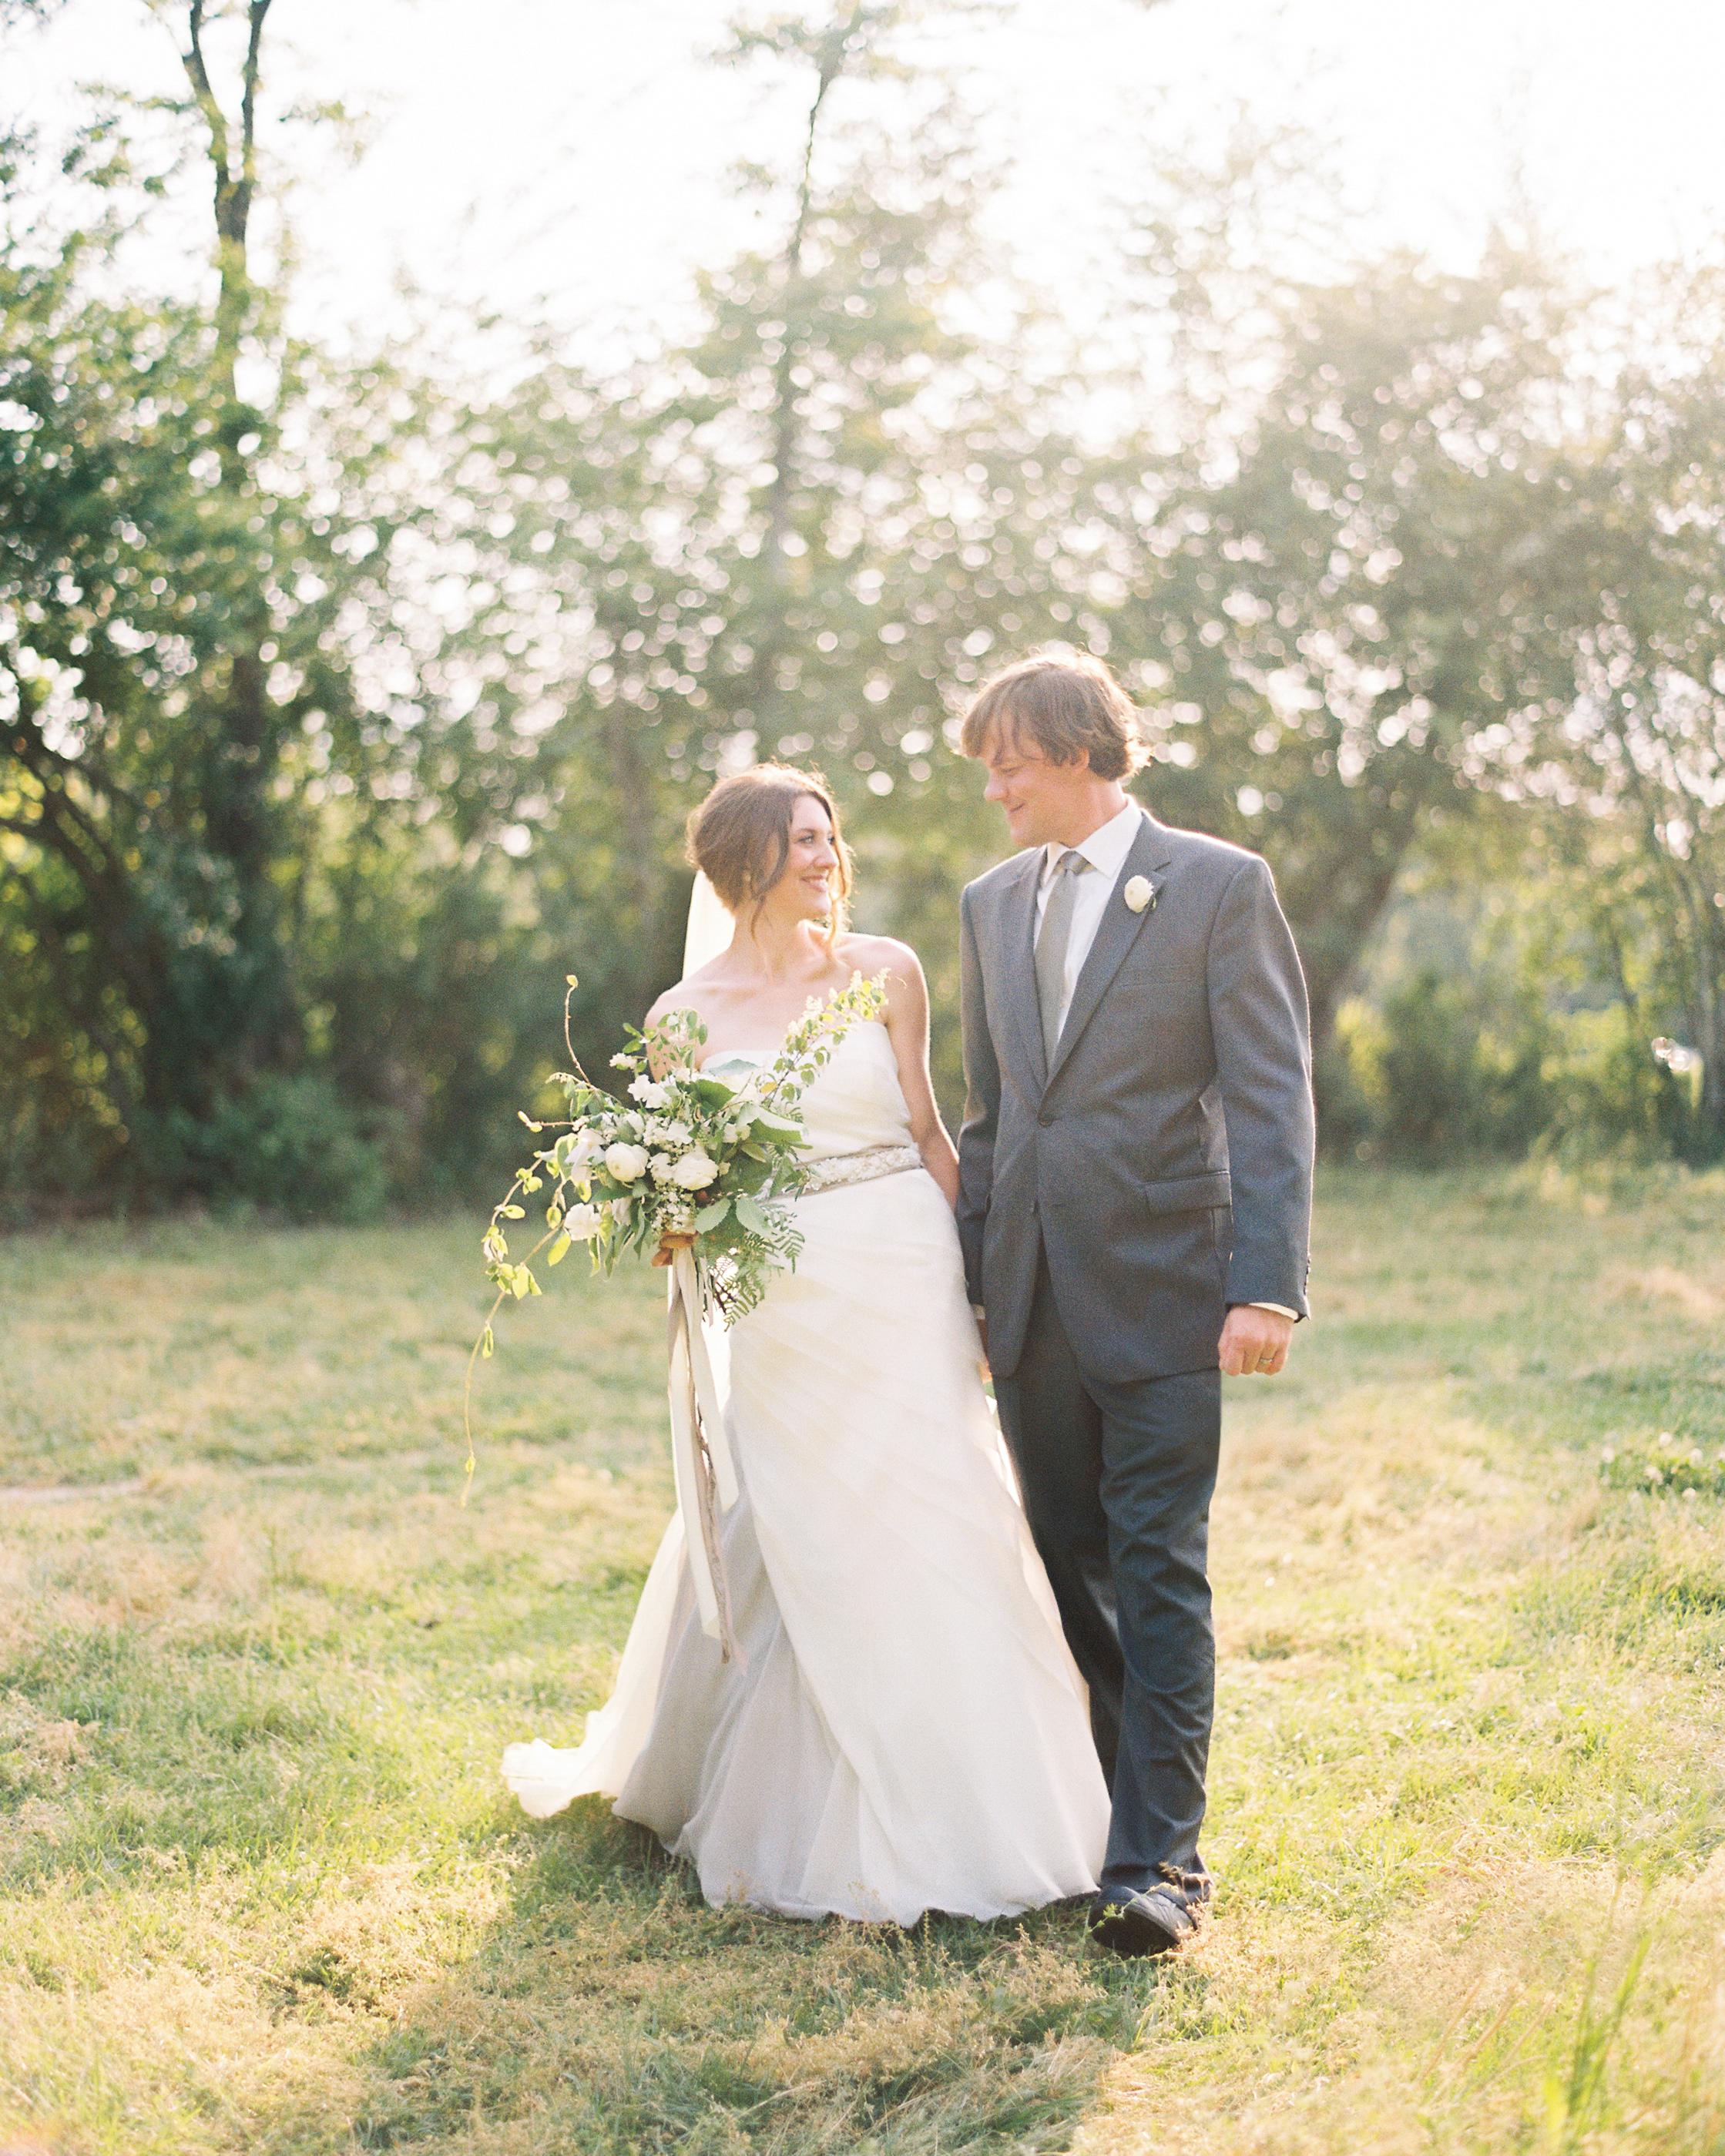 saron-neal-wedding-mississippi-00116-s111701.jpg